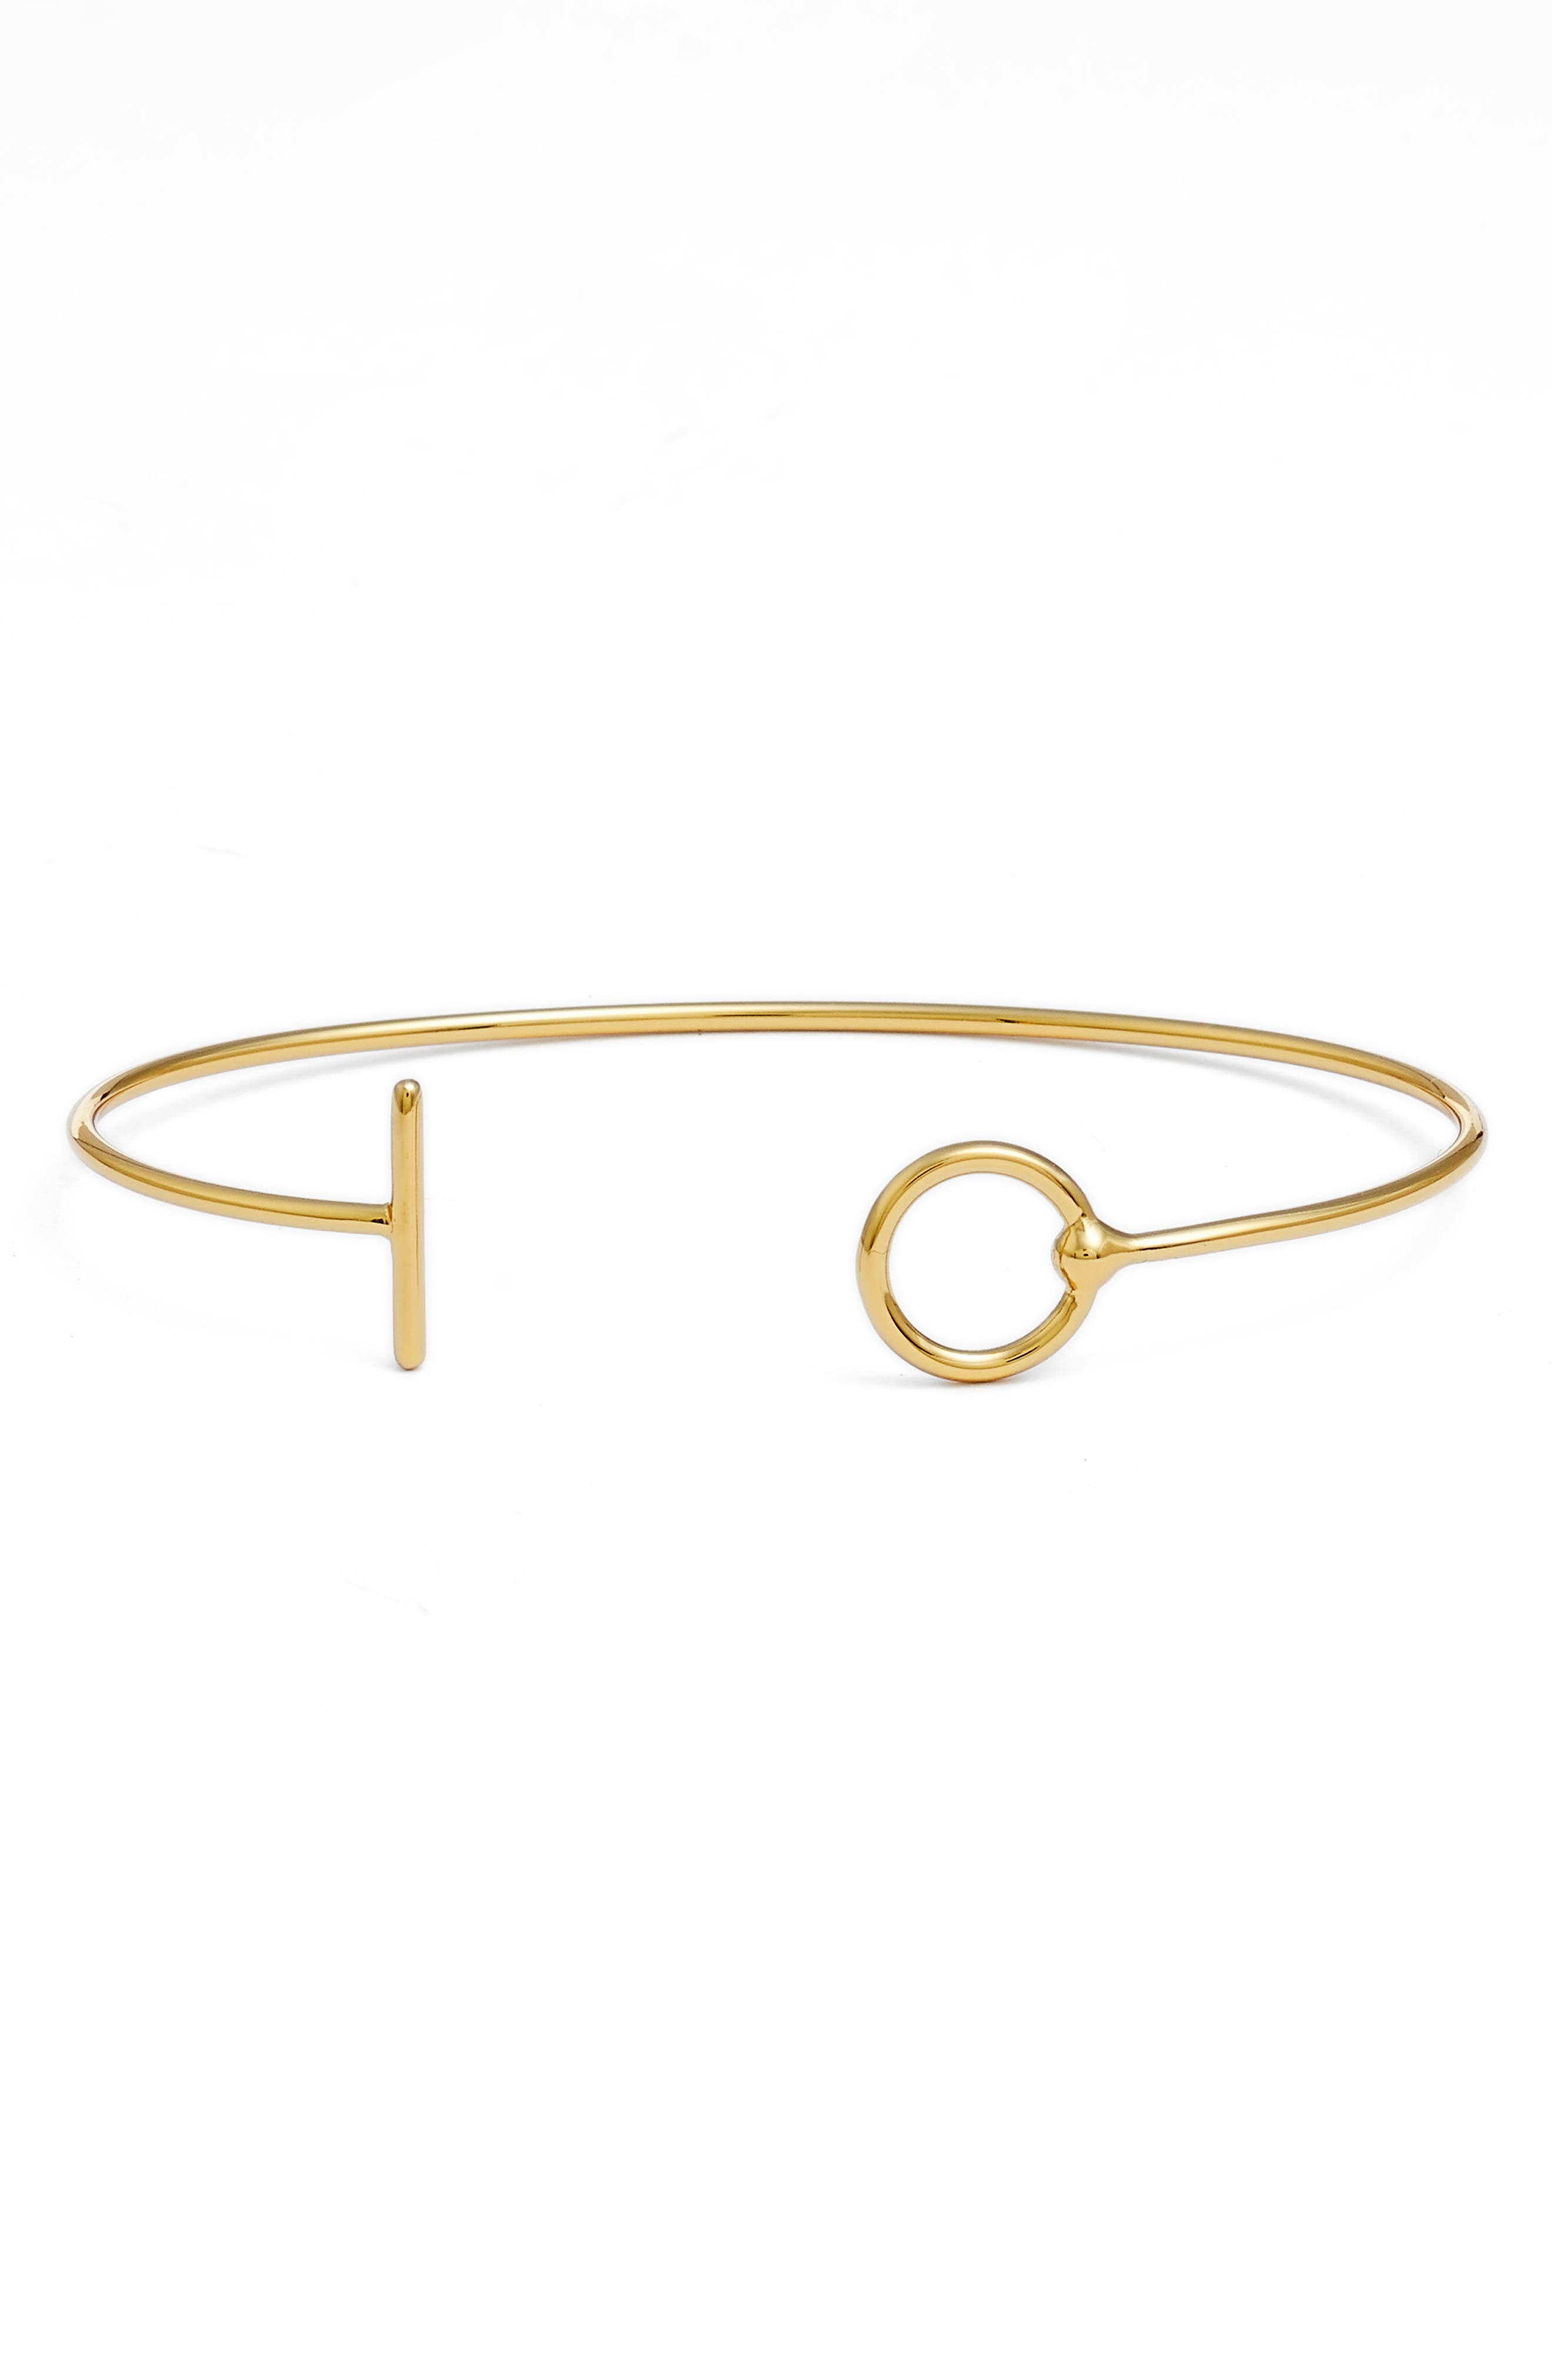 Bar & Circle Open Cuff Bracelet,                             Main thumbnail 1, color,                             714